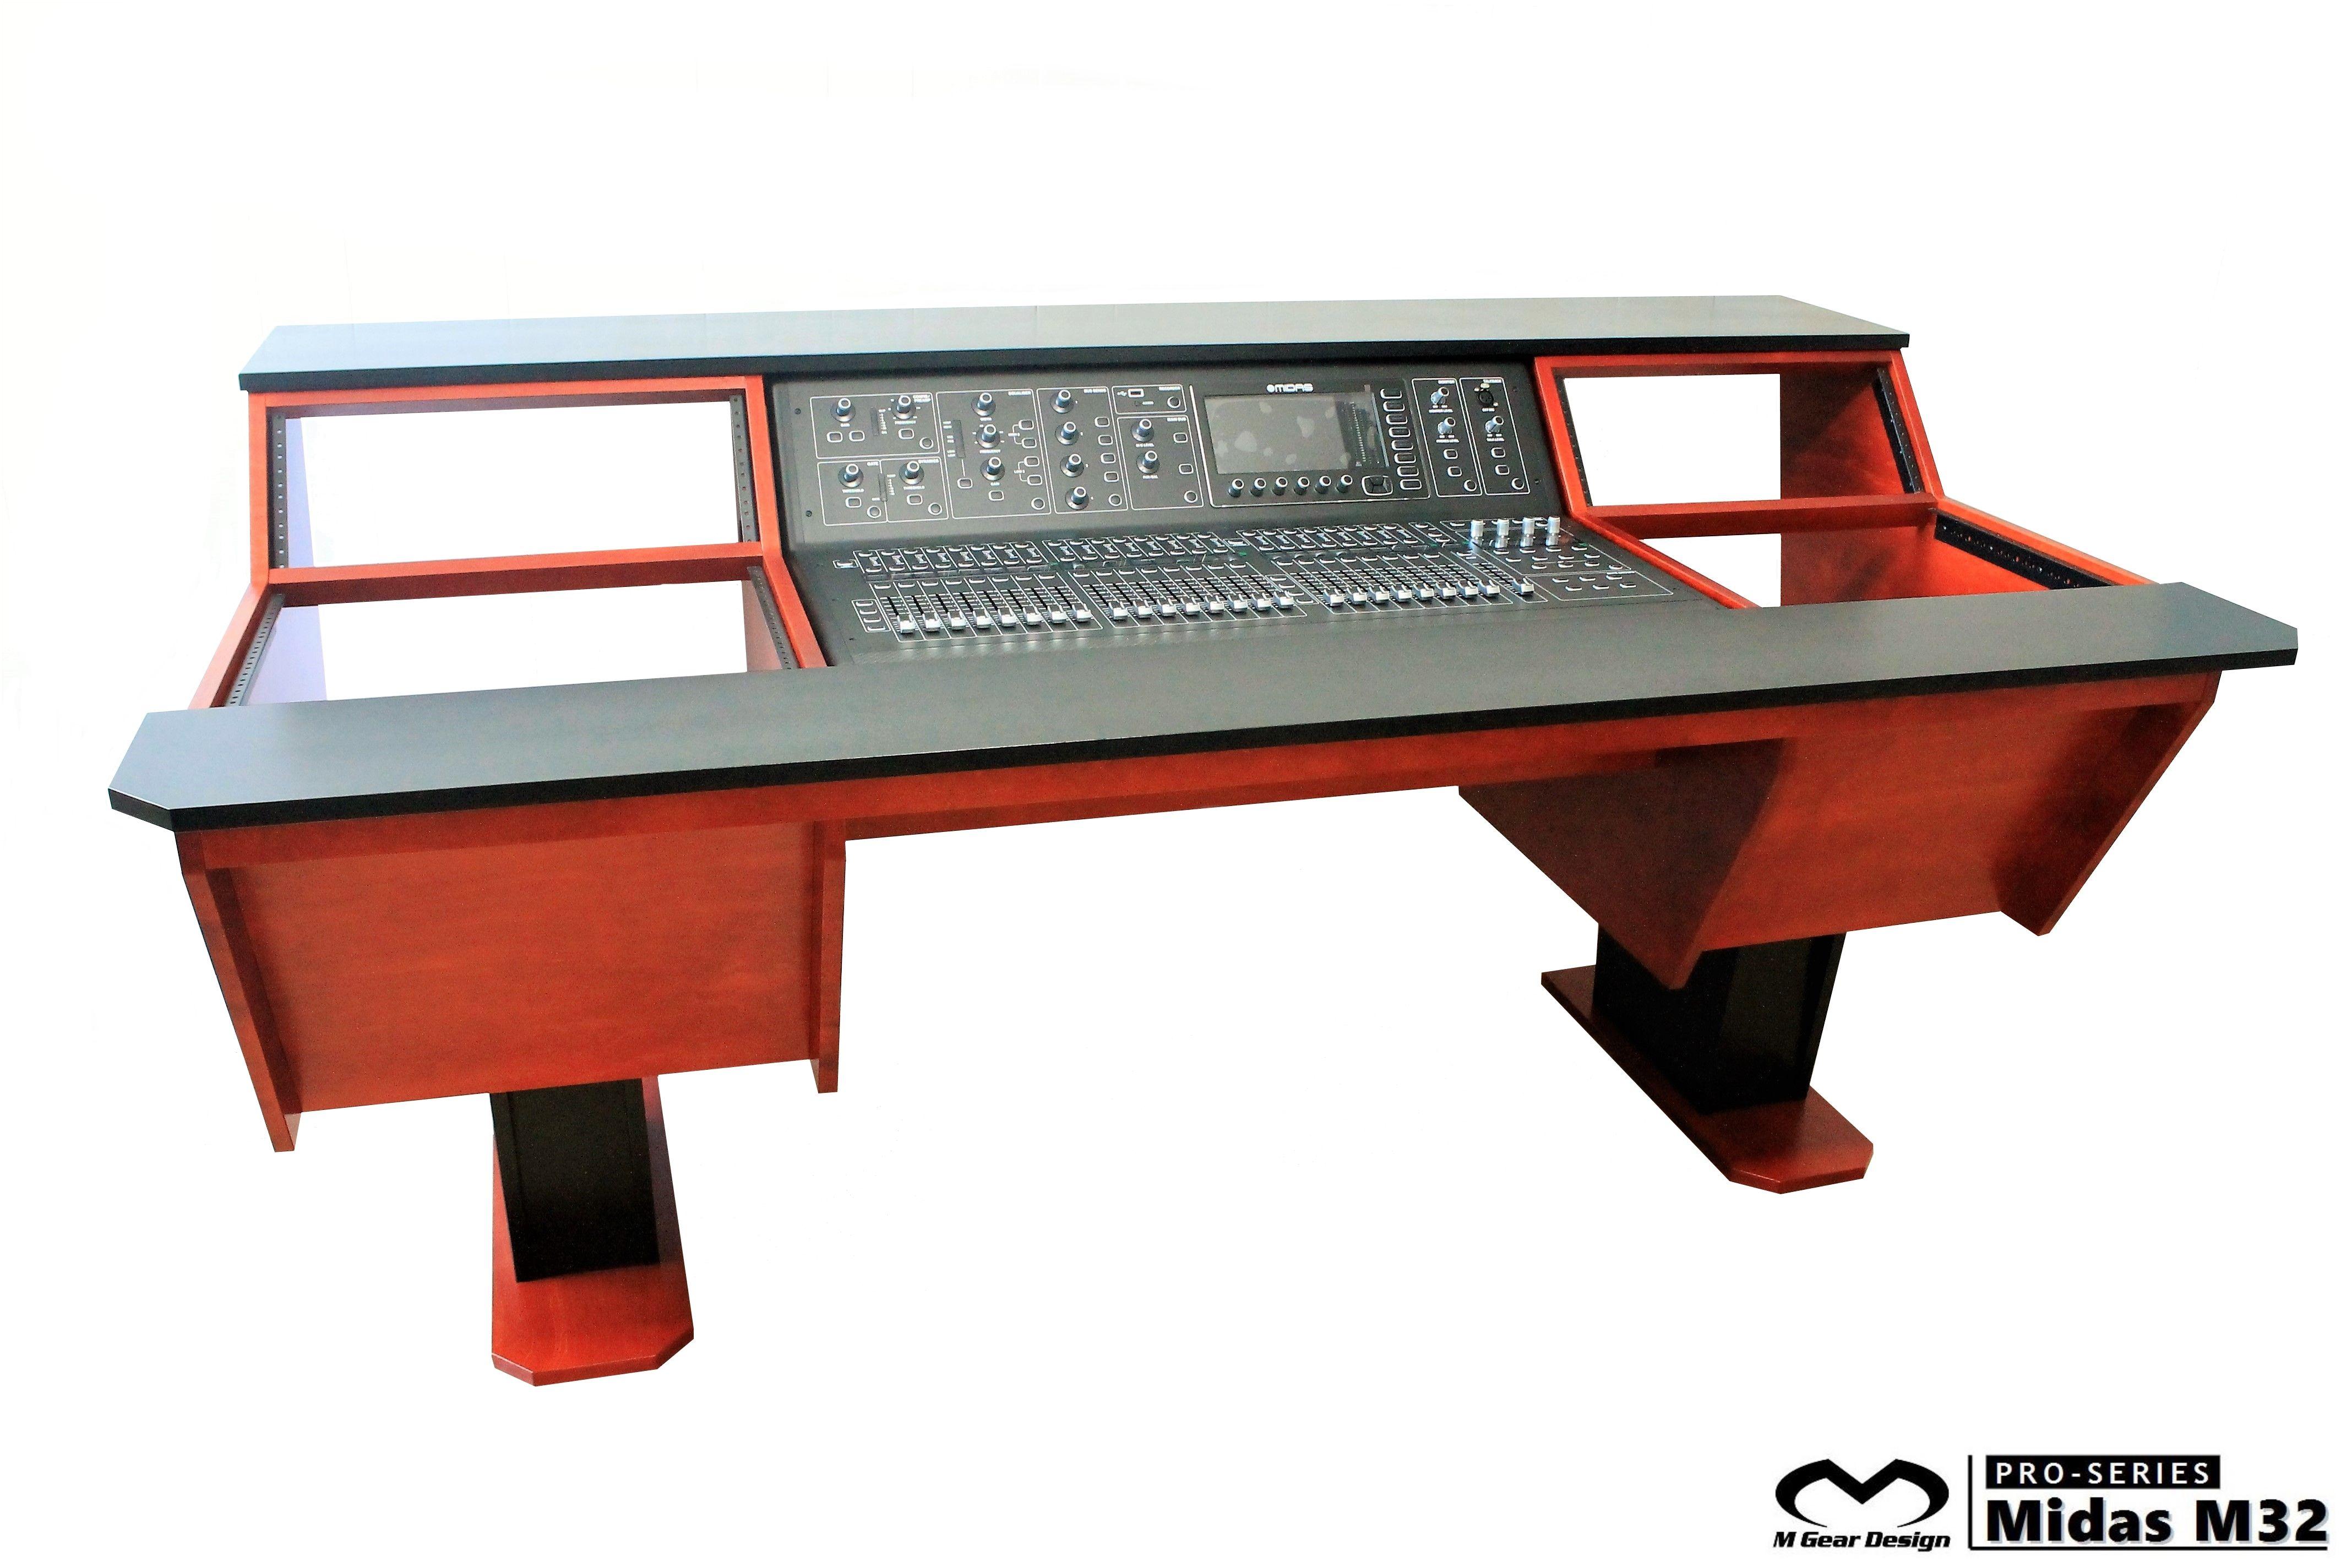 pro series midas m32 workstation recording studio pro series midas m32 workstation in 2019. Black Bedroom Furniture Sets. Home Design Ideas